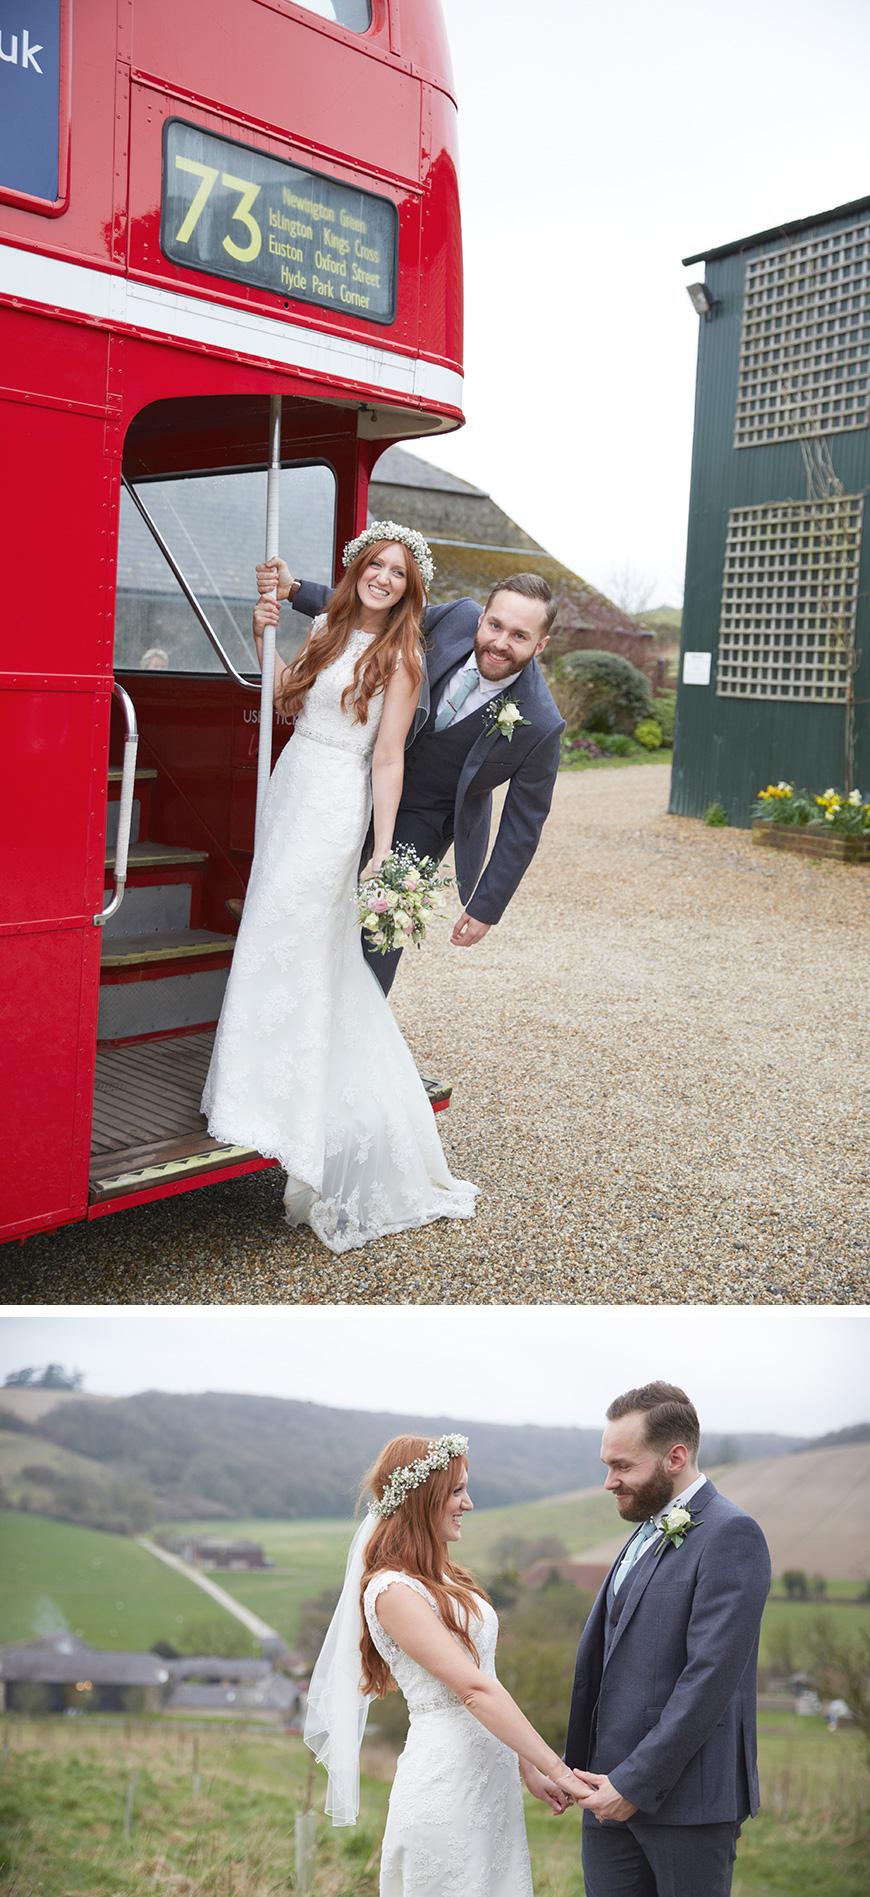 Real Wedding - Karis and Ed's Rustic Spring Wedding at Upwaltham Barns | CHWV